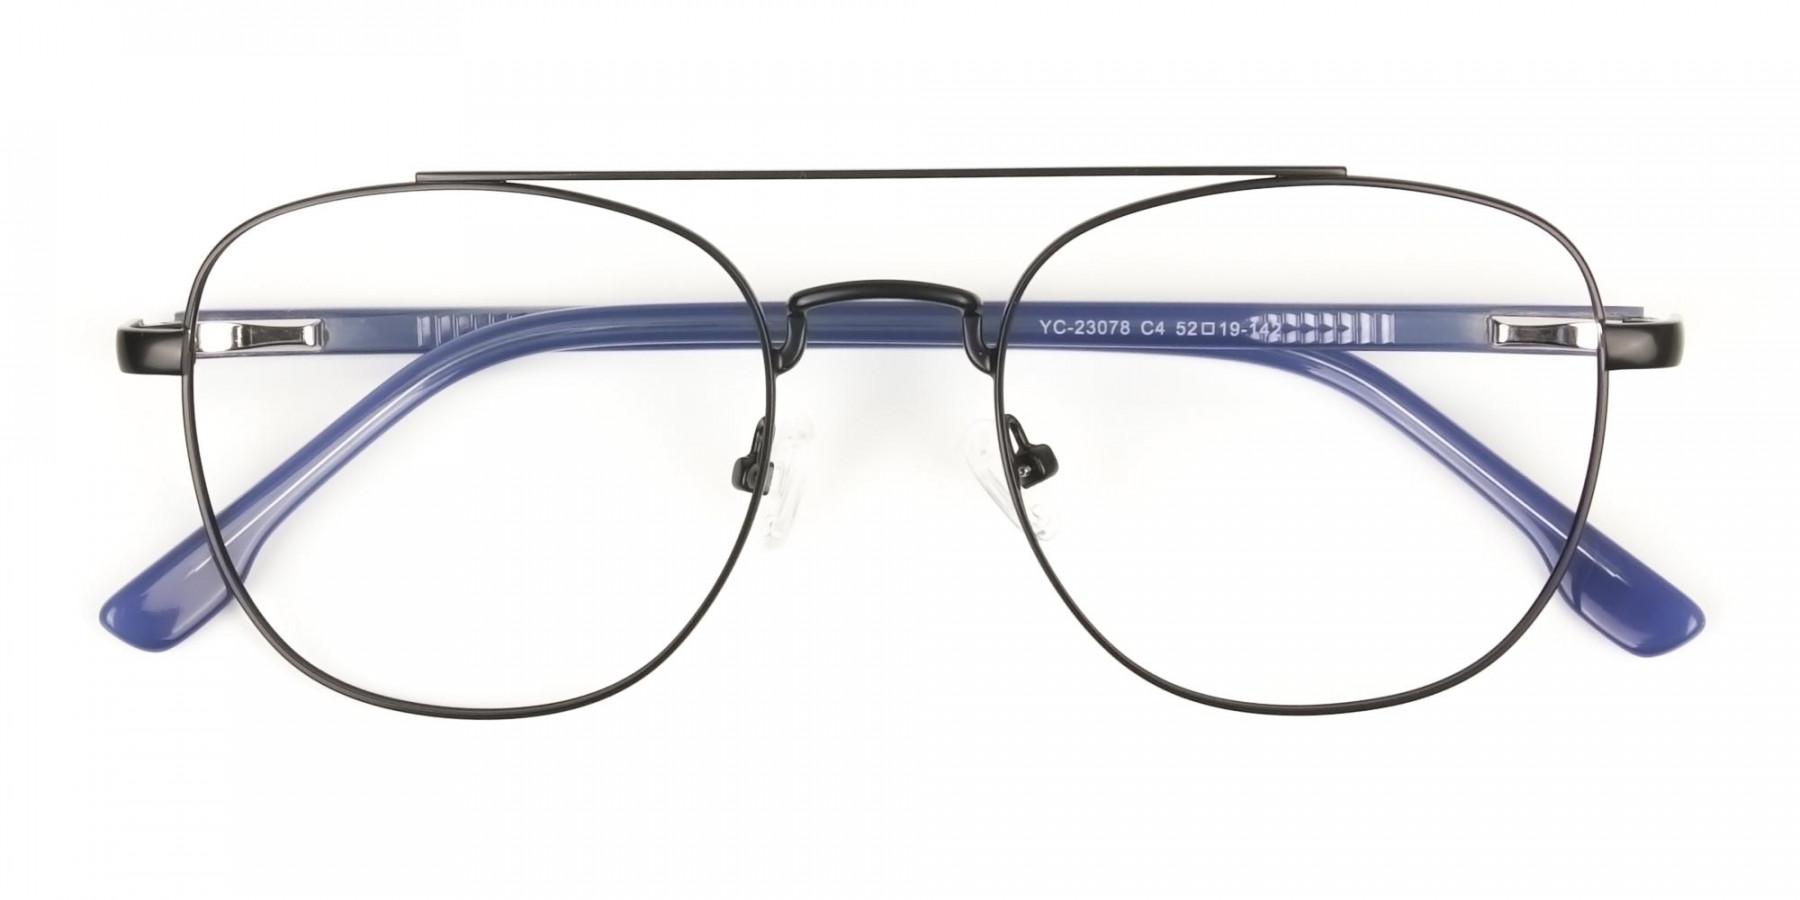 Black Aviator Wayfarer Glasses with Navy Blue Temple - 1